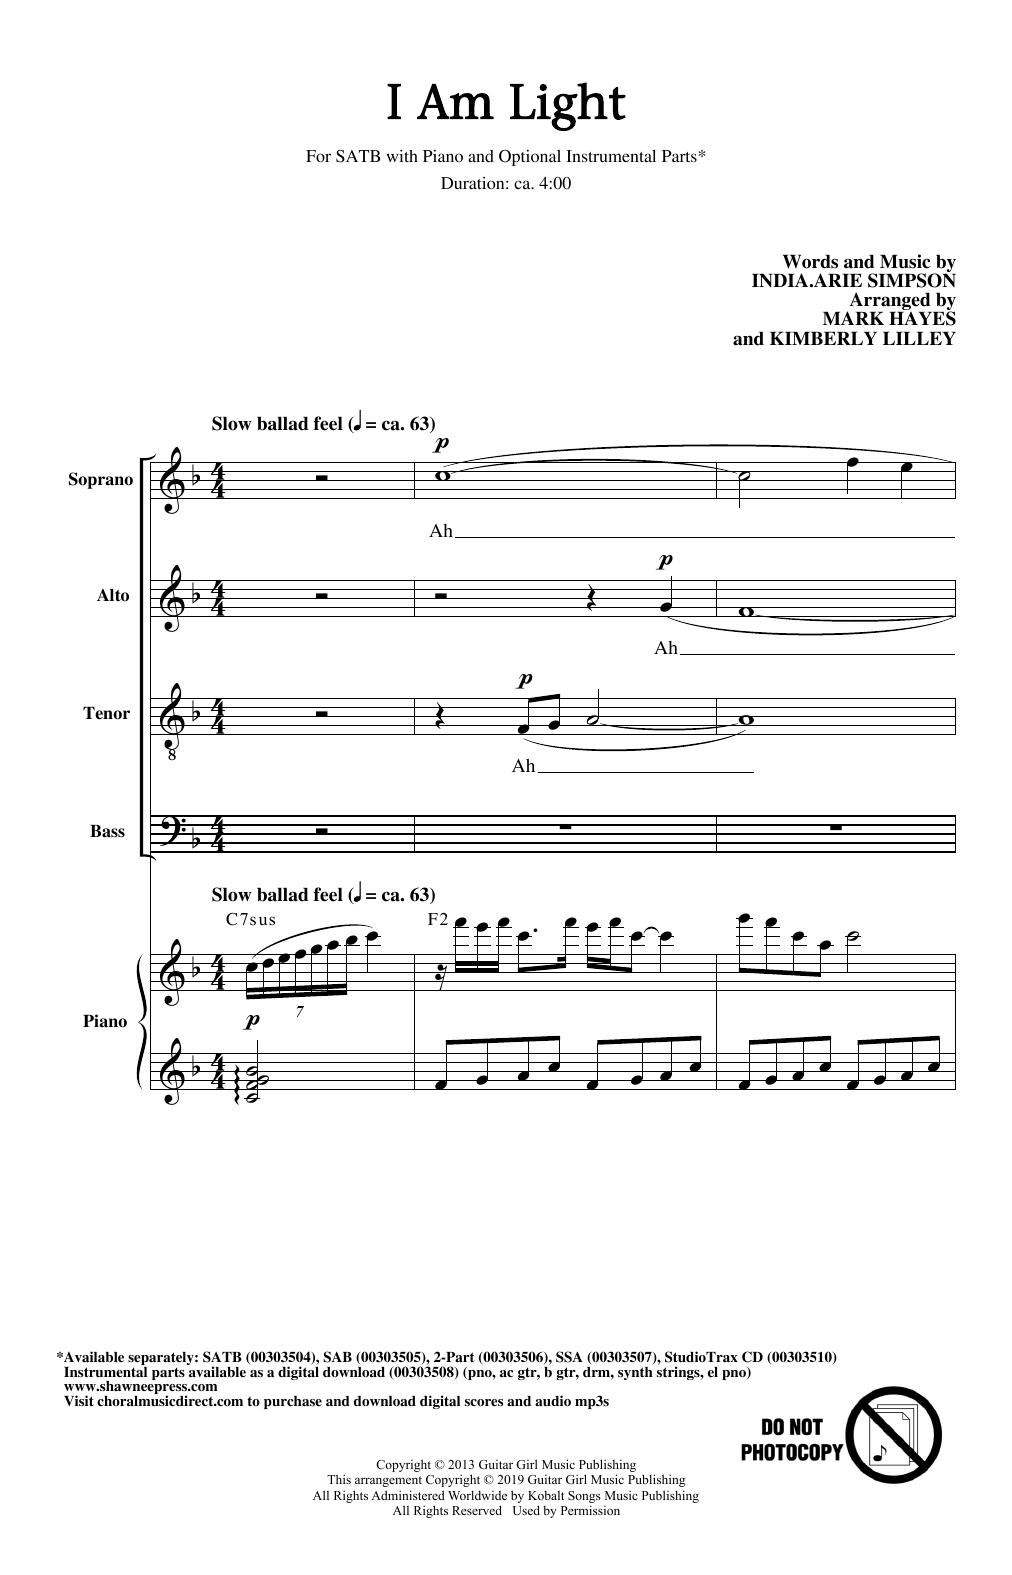 I Am Light (arr. Mark Hayes and Kimberly Lilley) (SATB Choir)